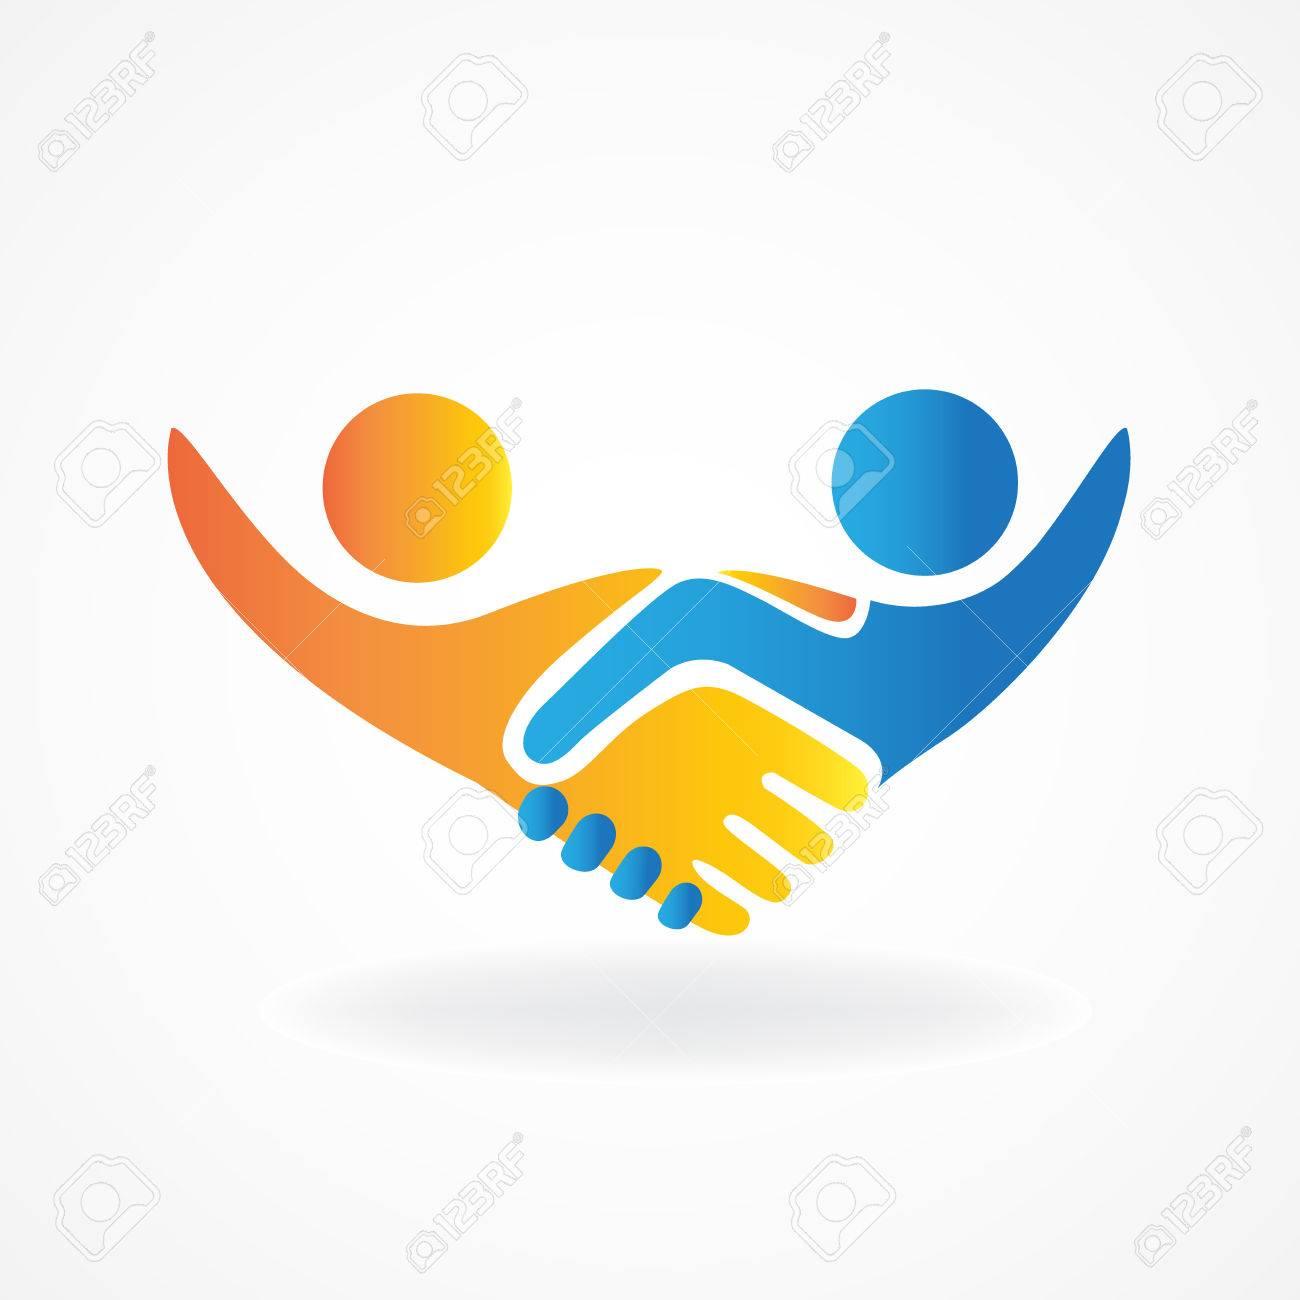 Handshake people in business vector icon - 80225347